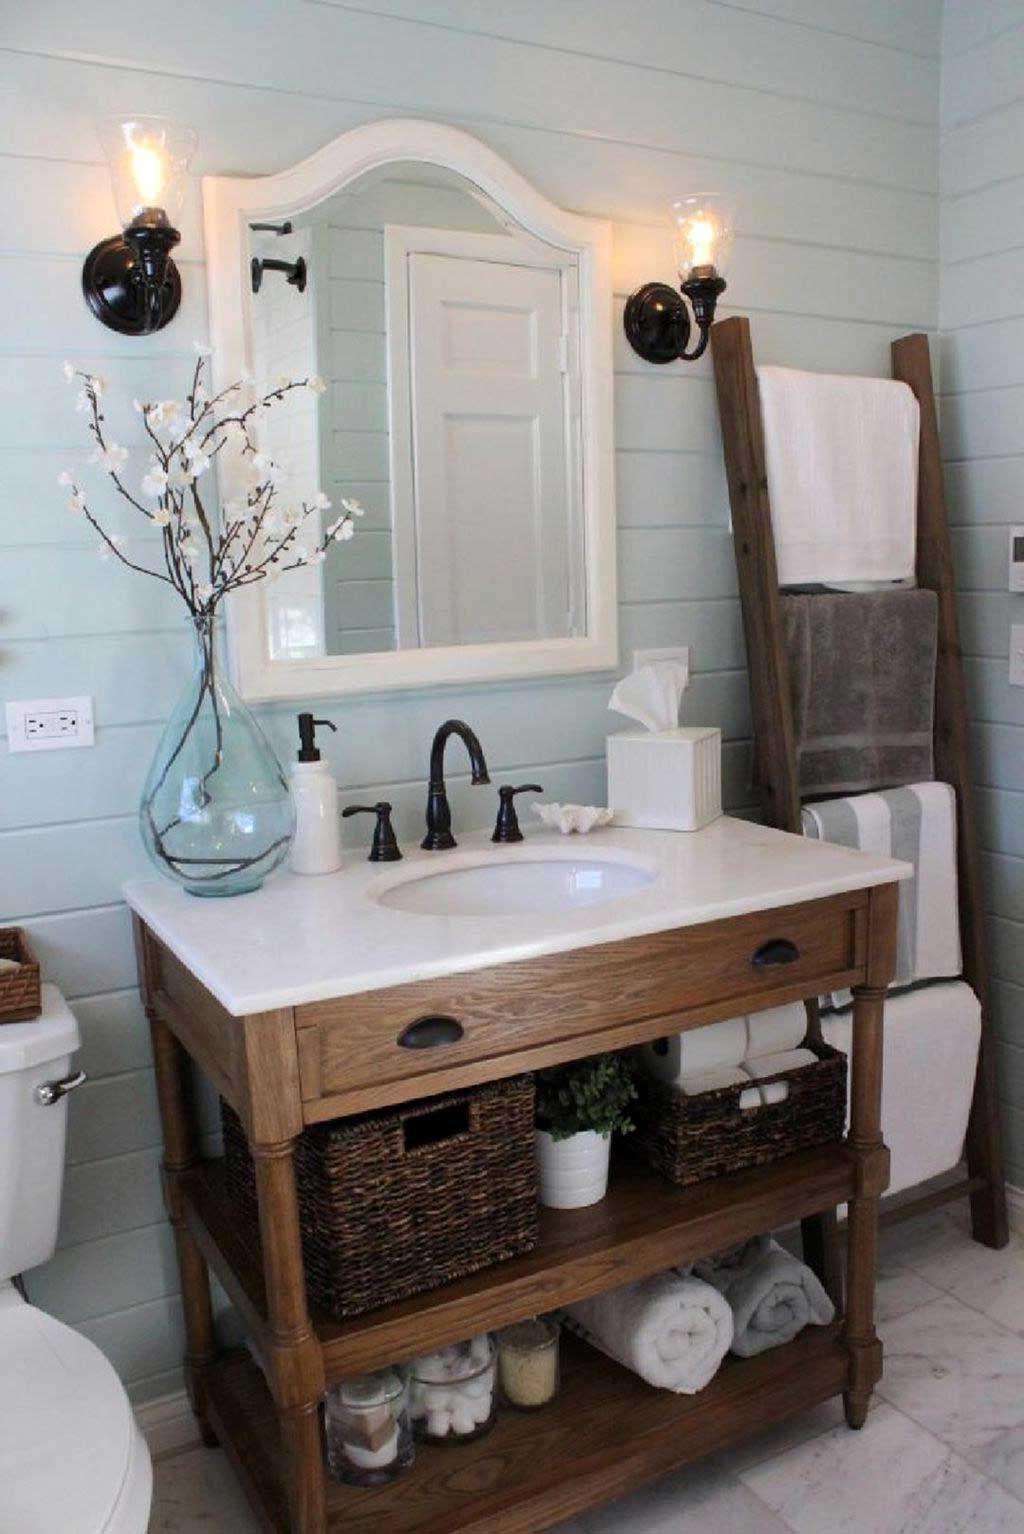 44 low cost farmhouse bathroom design ideas 15 with lamp